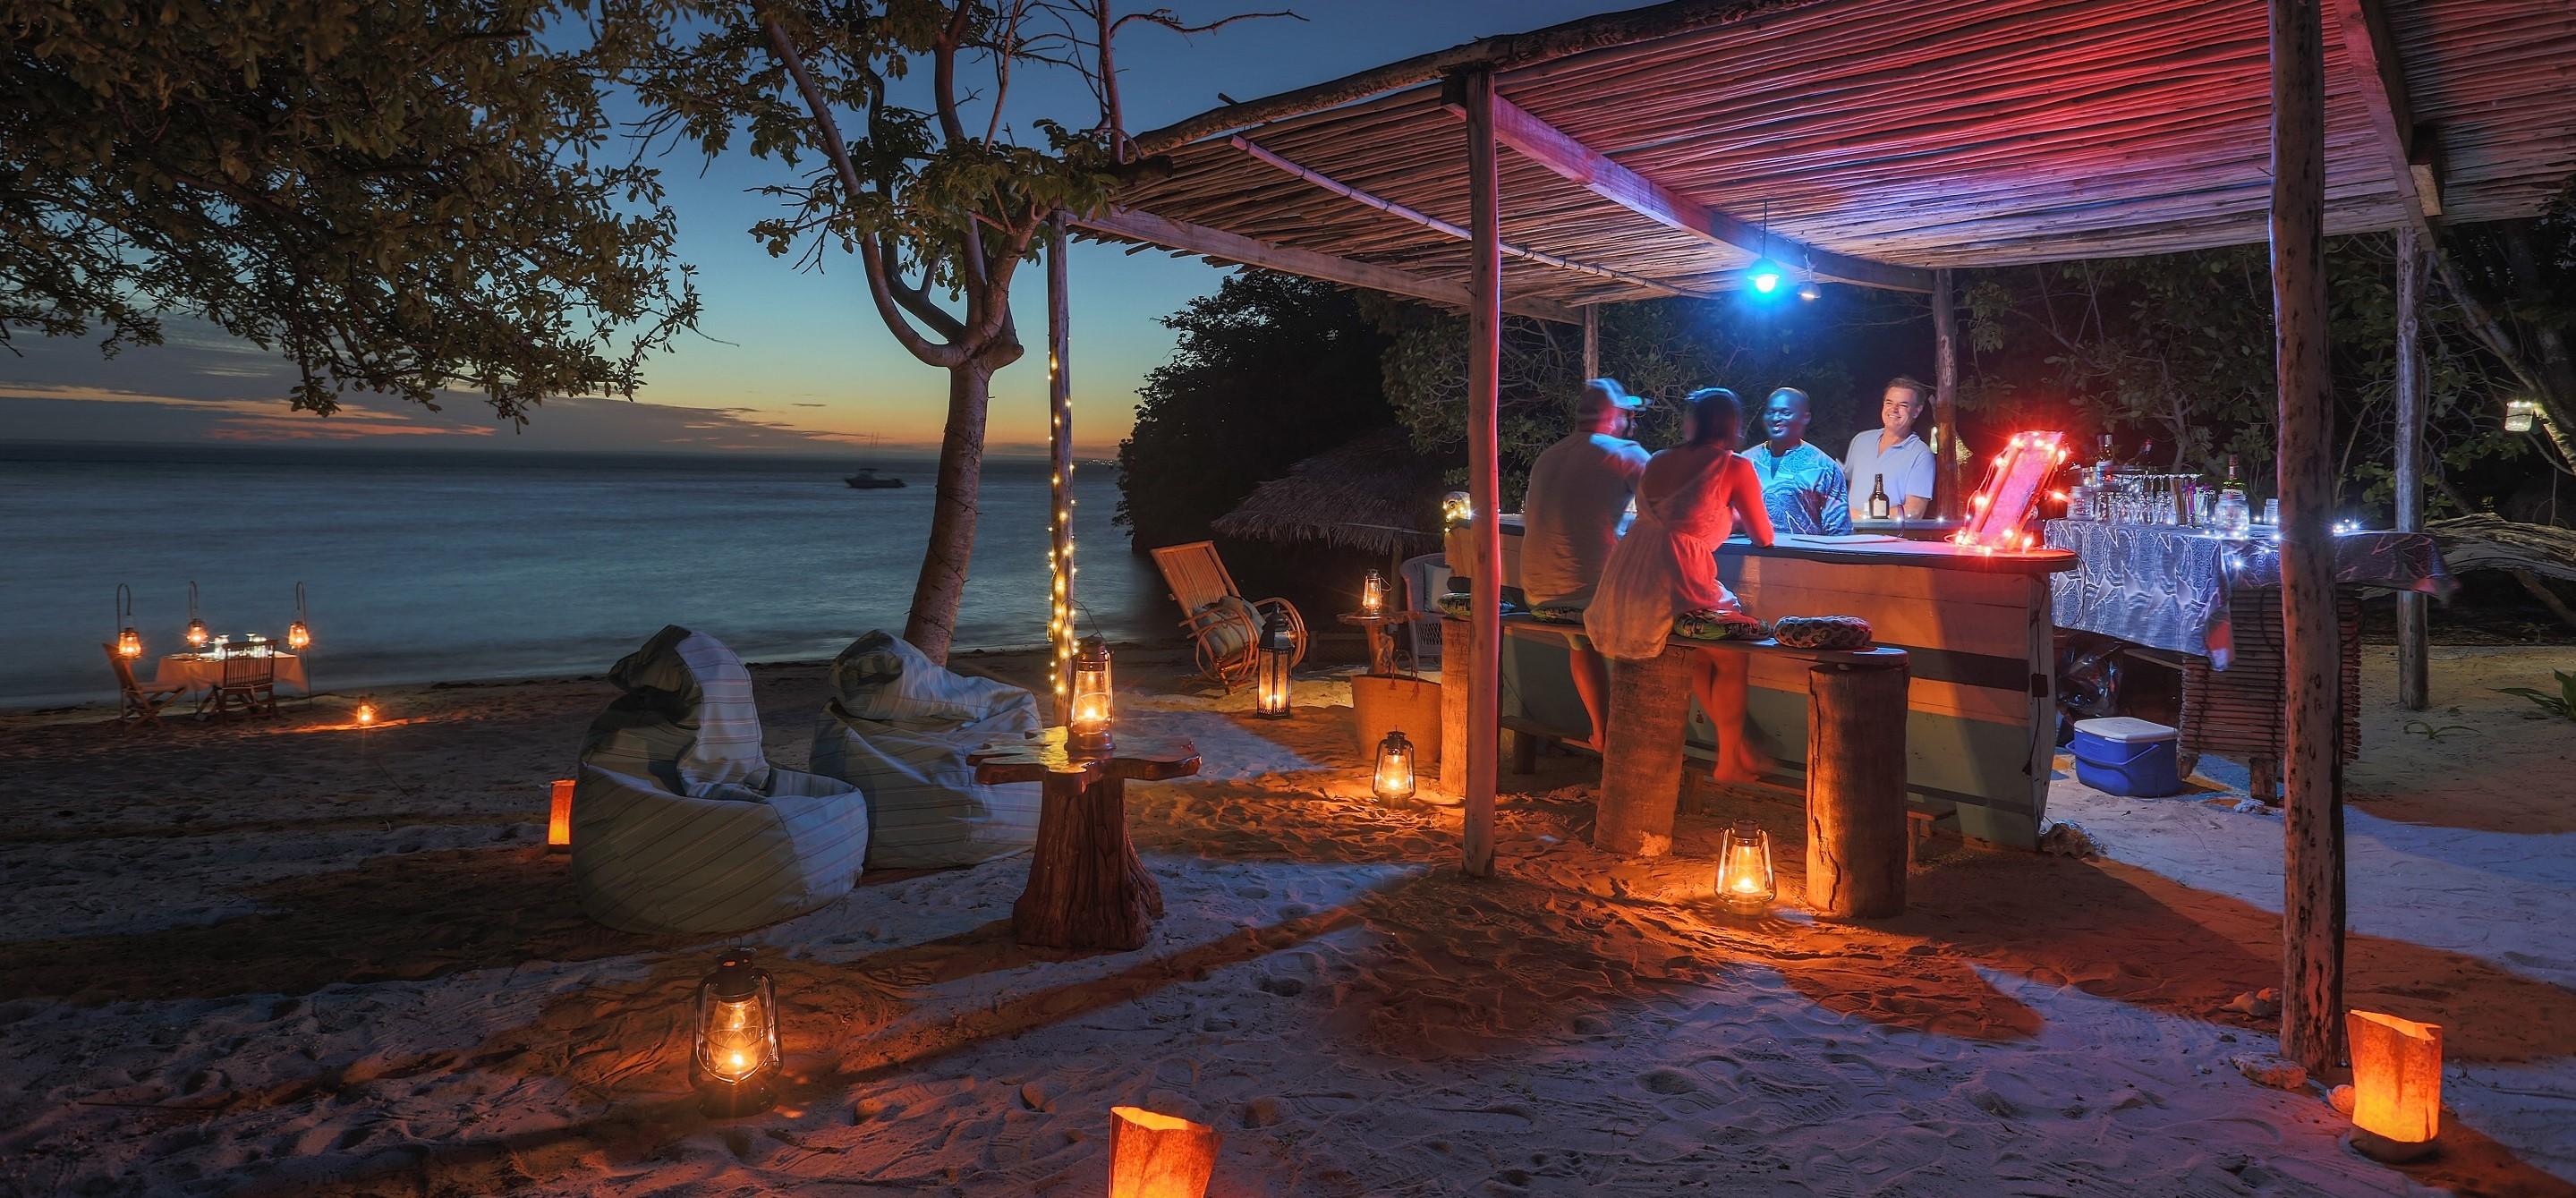 azura_quilalea_mozambique_beach_bar